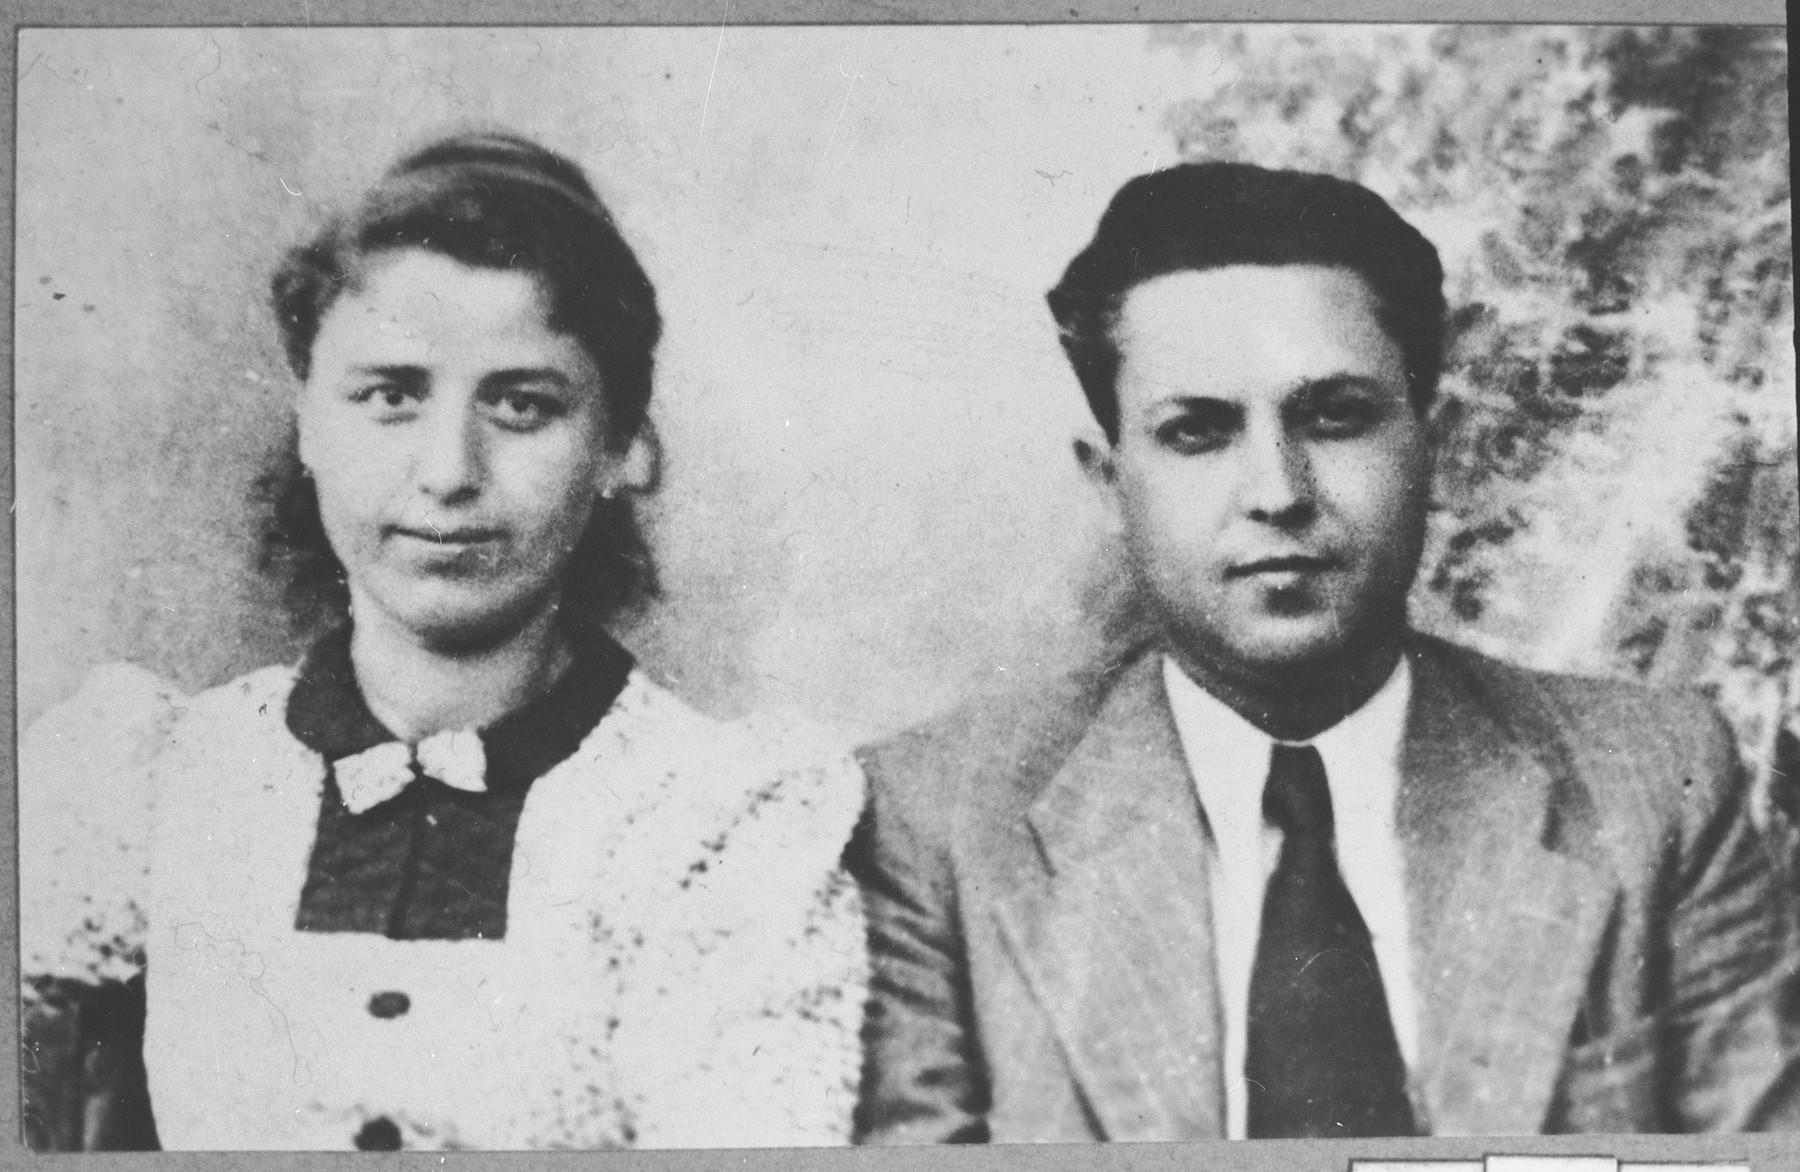 Portrait of Zak Kalderon, son of Mushon Kalderon, and his wife, Rebeka.  Zak was a chopper.  They lived at Miloyevitsa 24 in Bitola.